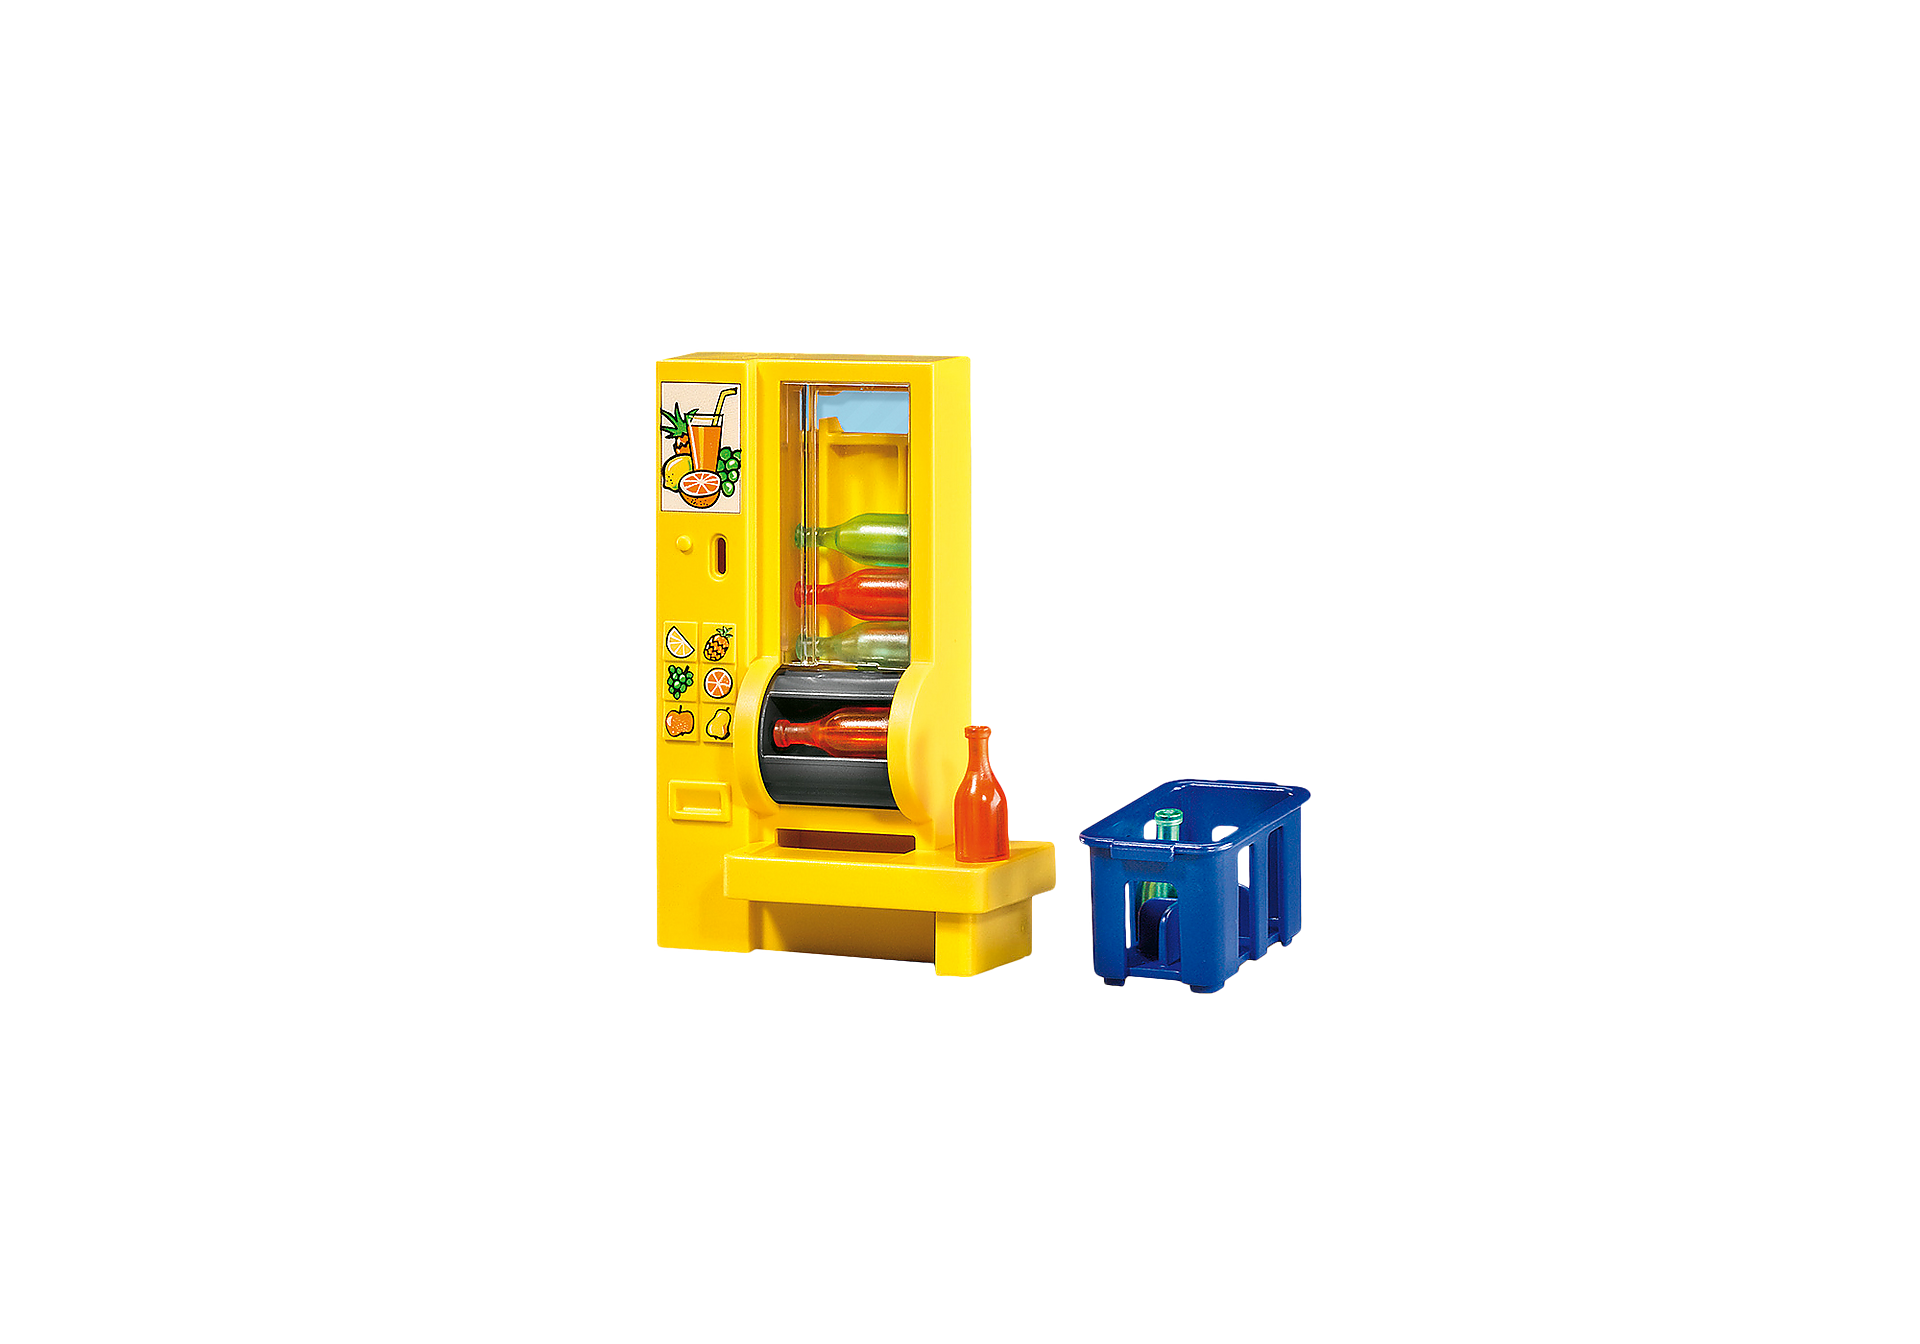 7931 Getränkeautomat zoom image1